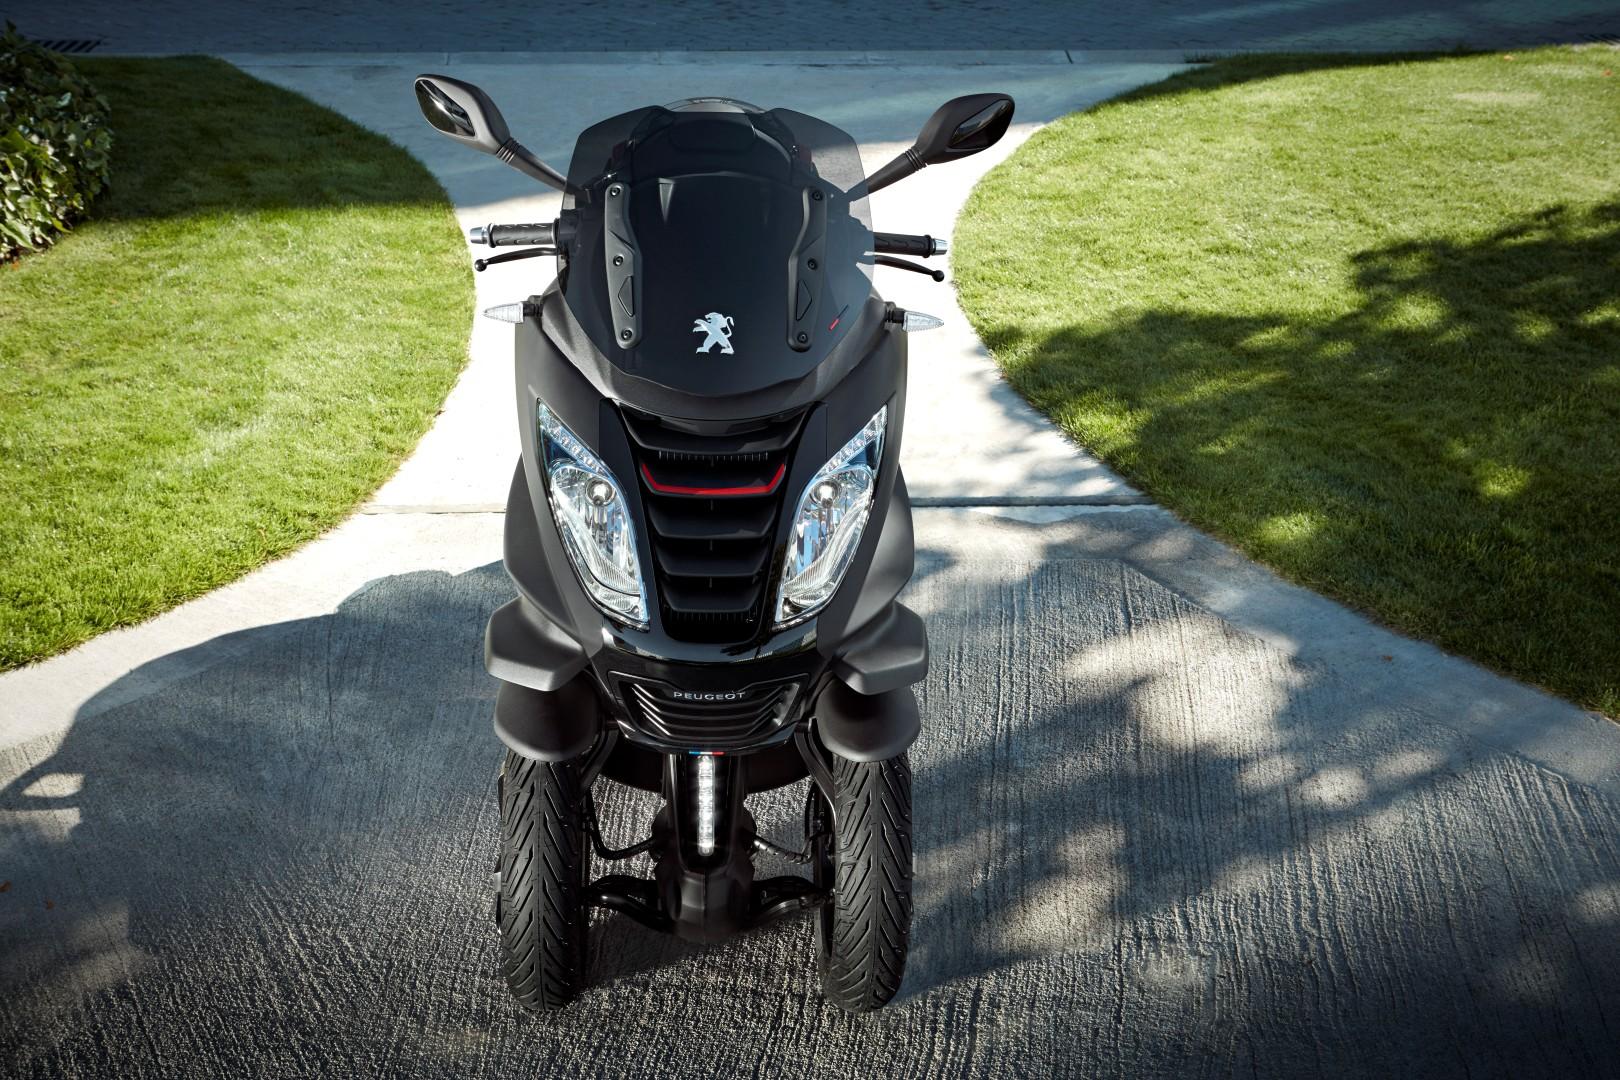 Peugeot Metropolis 400 fotos